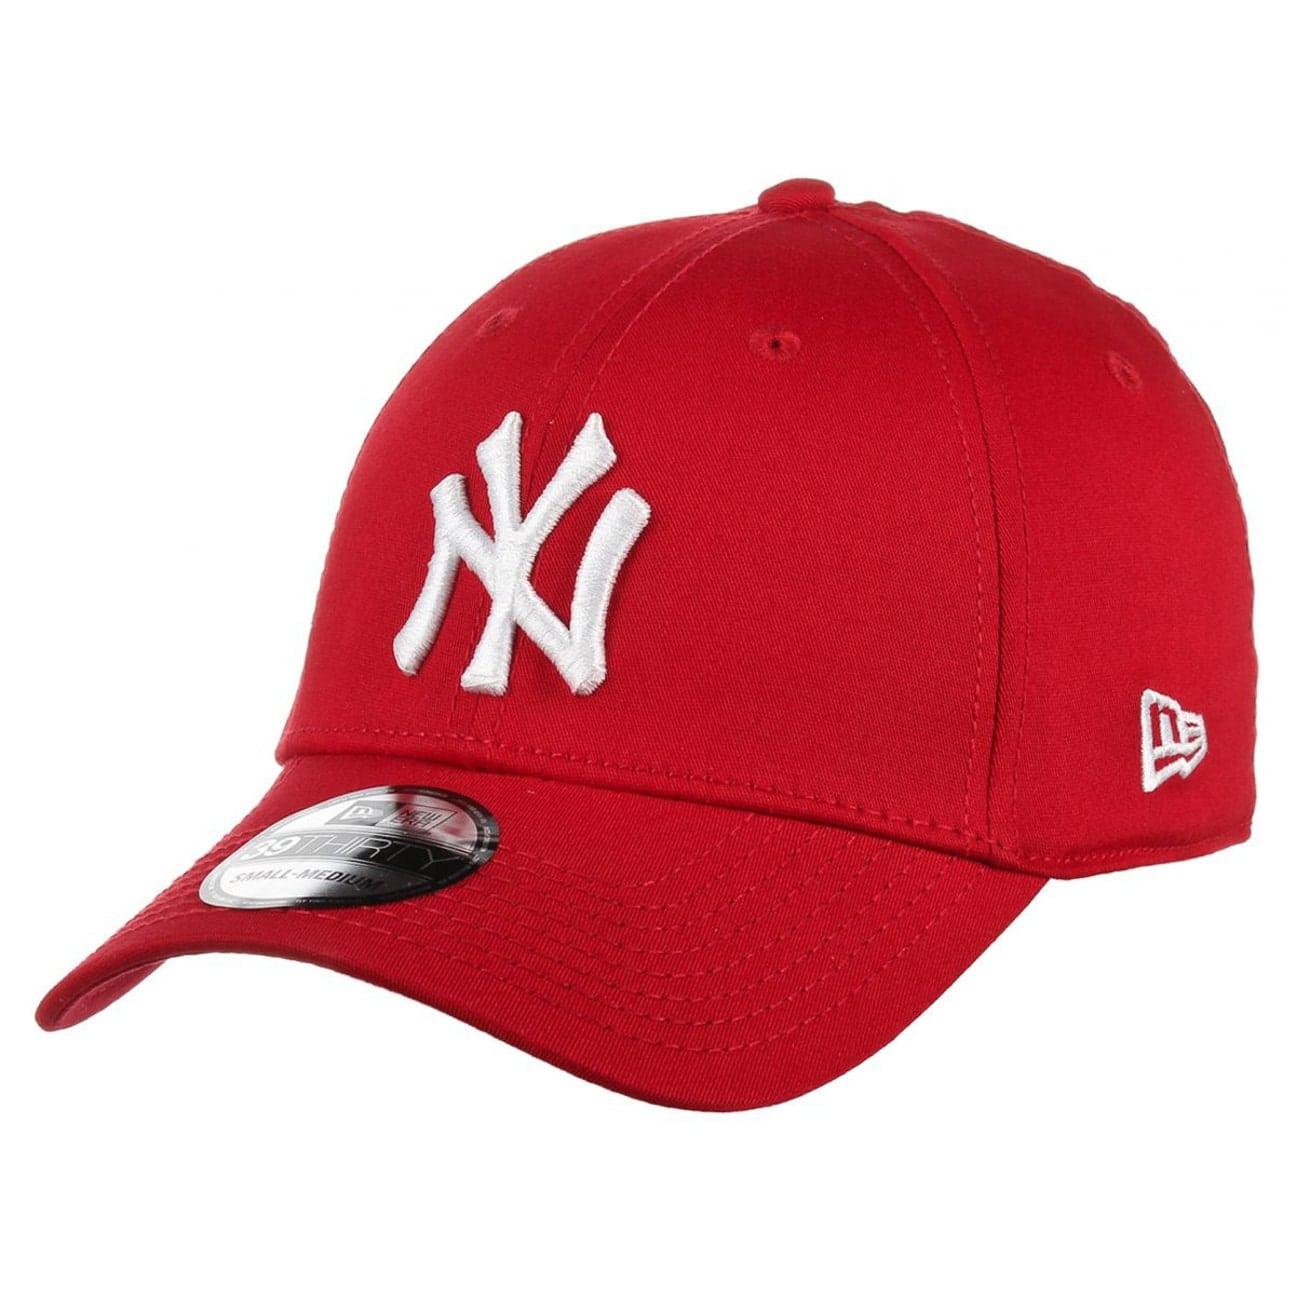 groothandel nieuwe foto's geweldige kwaliteit 39Thirty League NY Basic Cap by New Era